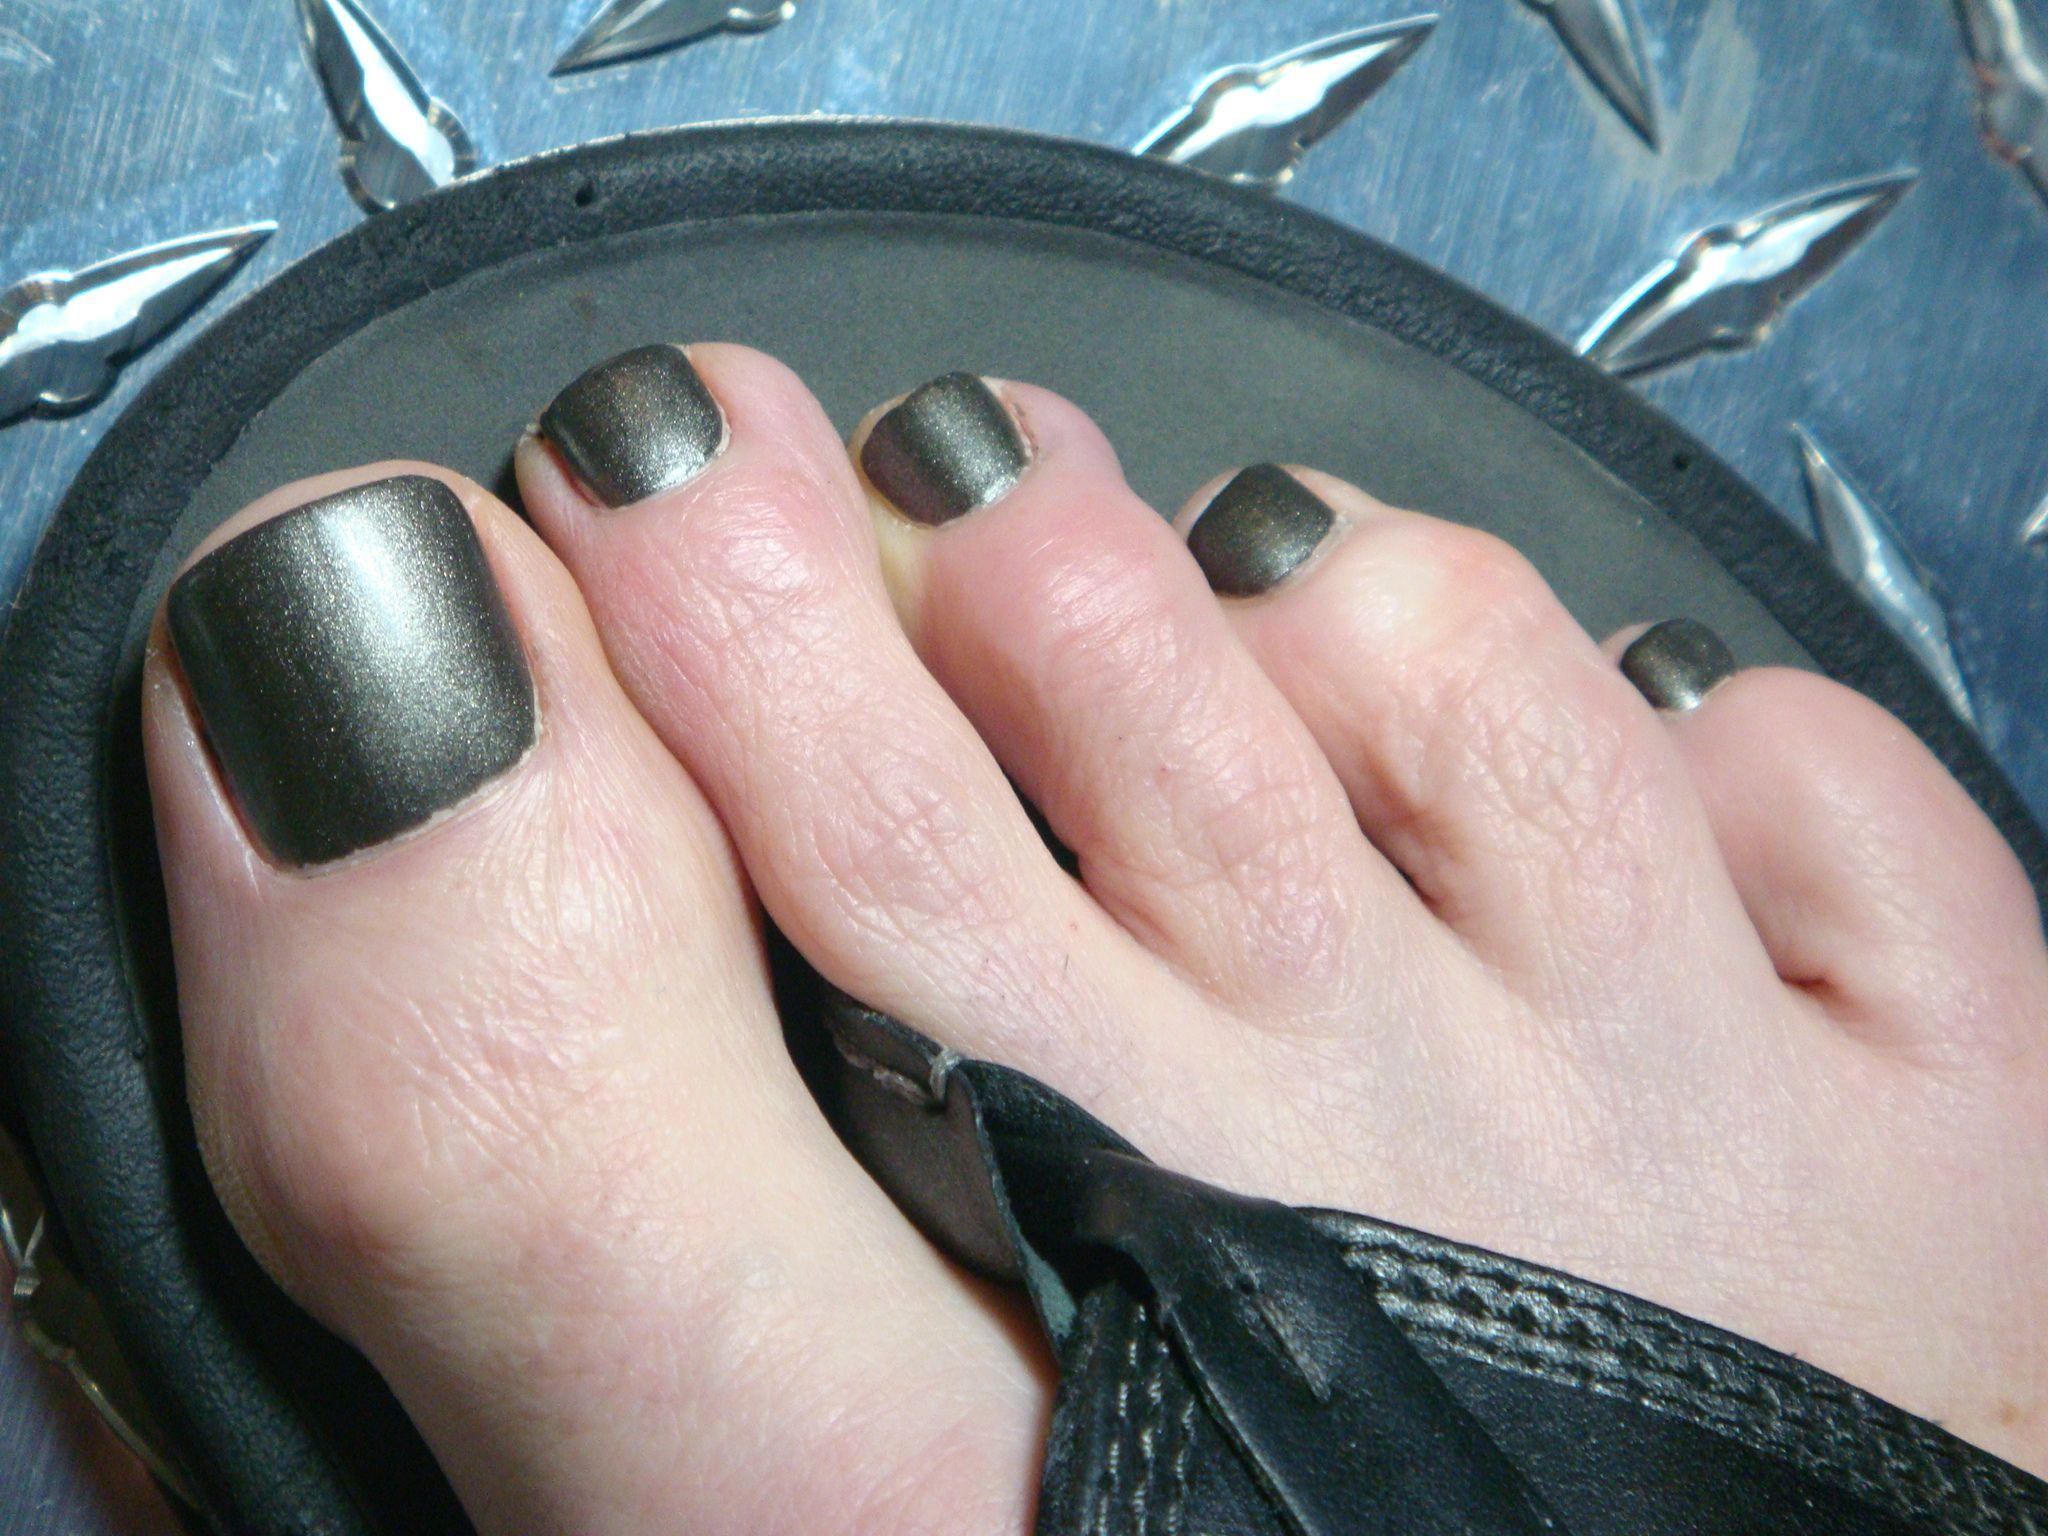 Bb Couture For Men Full Metal Jacket In 2019 Men Nail Polish Black Toe Nails Nail Colors